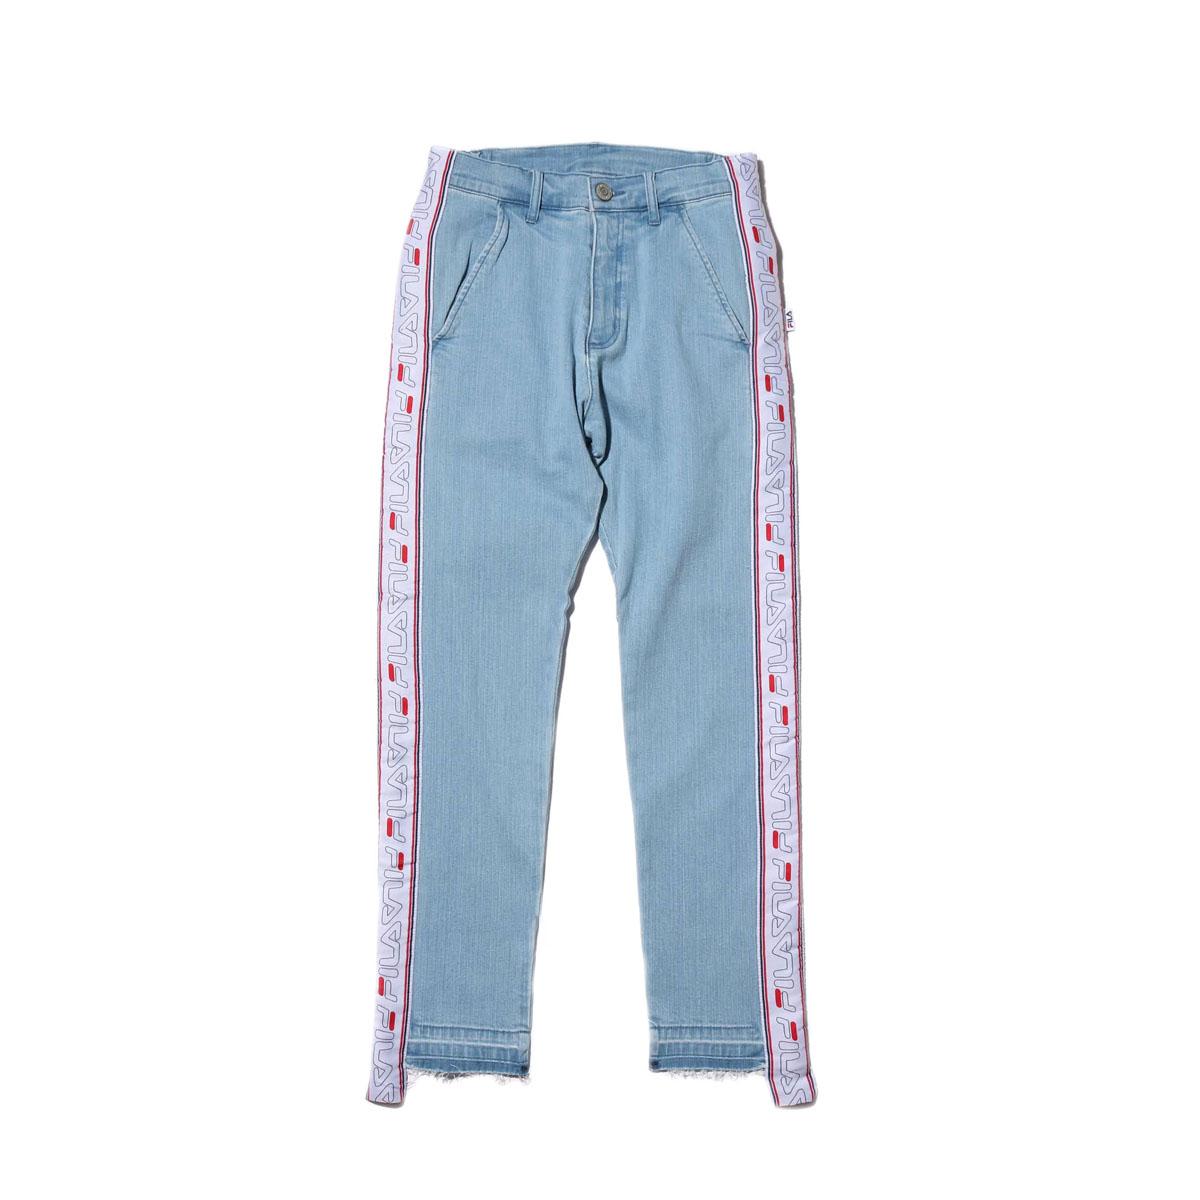 FILA Skinny pants (フィラ スキニ― デニム パンツ)BLUE【メンズ パンツ】18FW-I